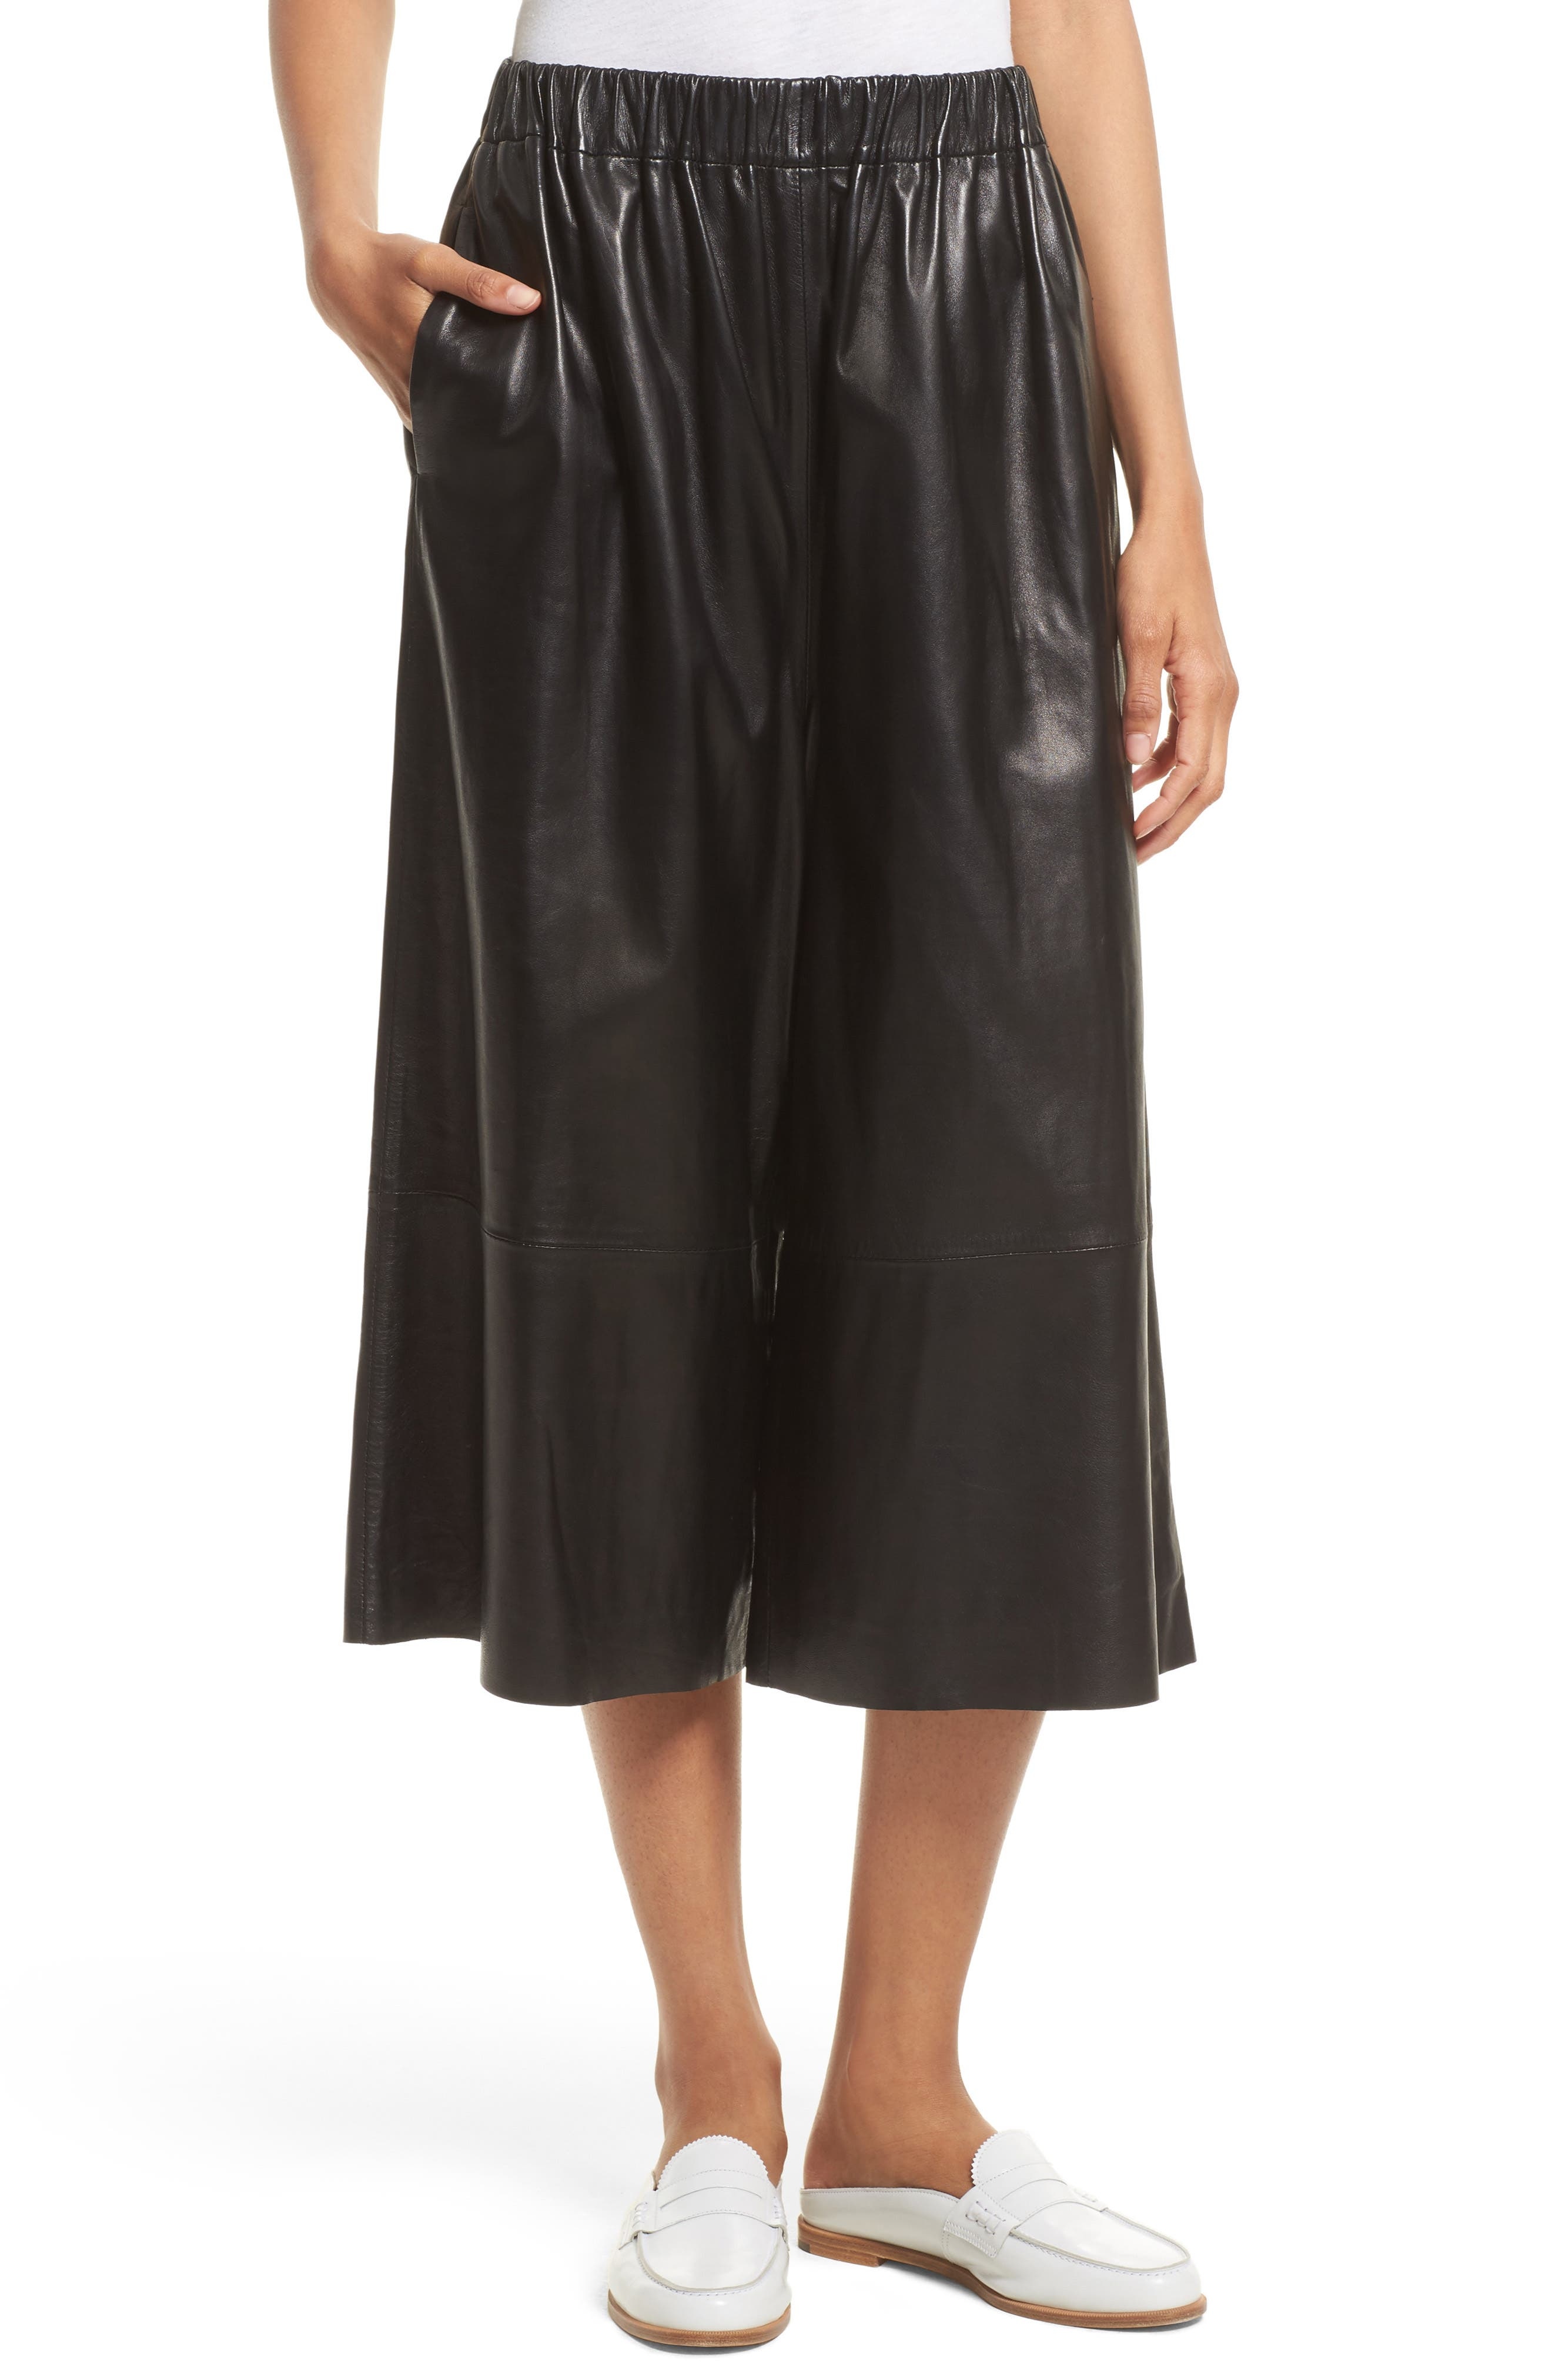 Alternate Image 1 Selected - Robert Rodriguez Leather Gaucho Pants